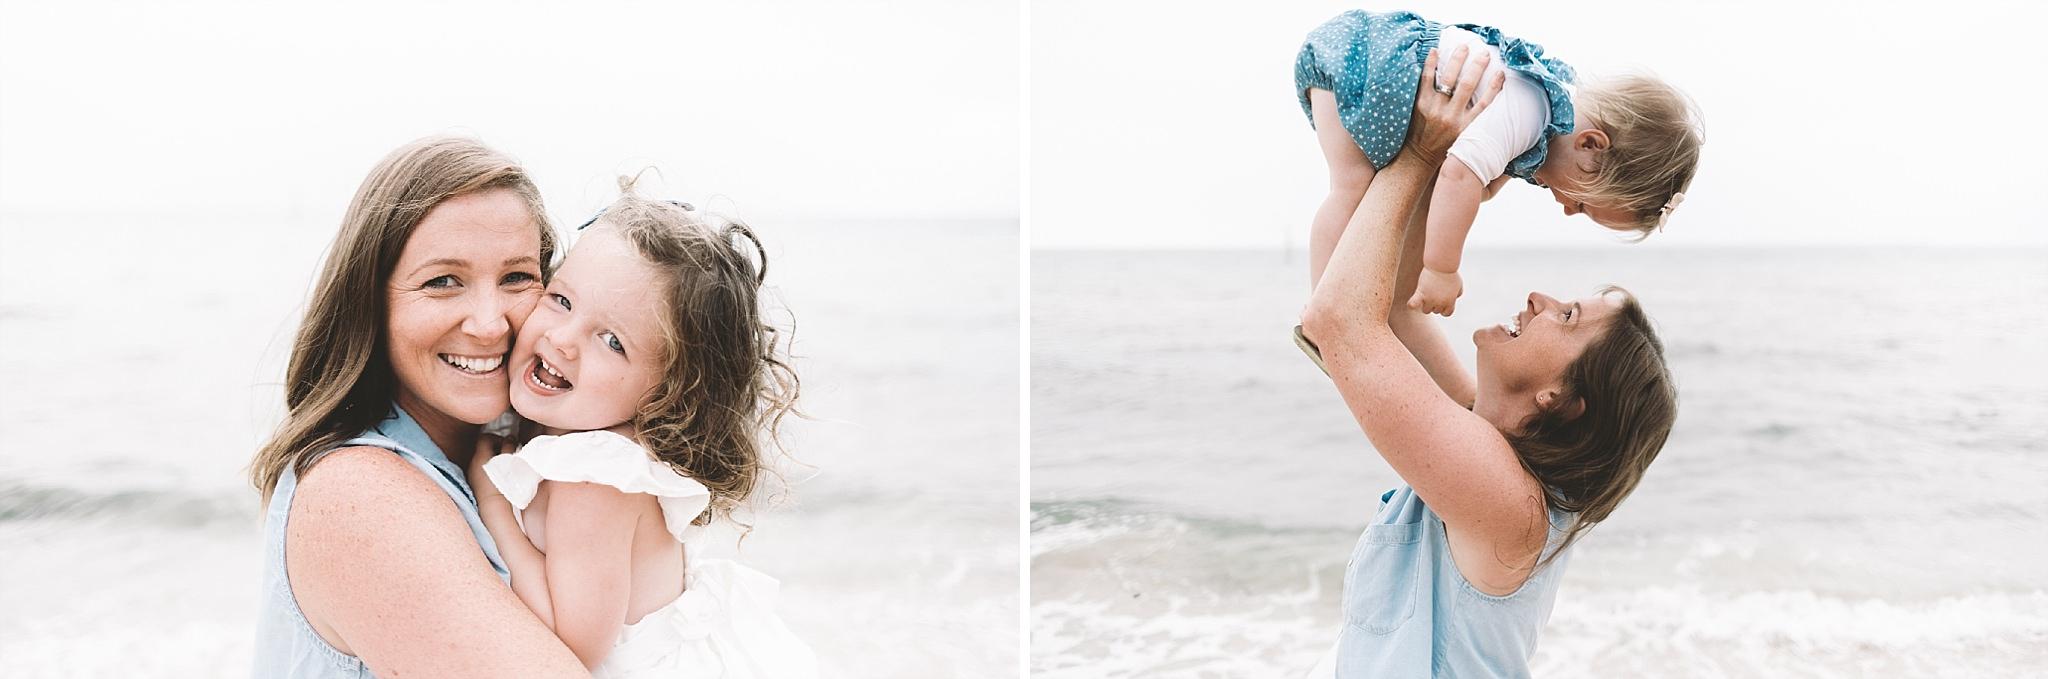 Lecinda Ward, Melbourne Family Newborn and Wedding Photographer_0124.jpg